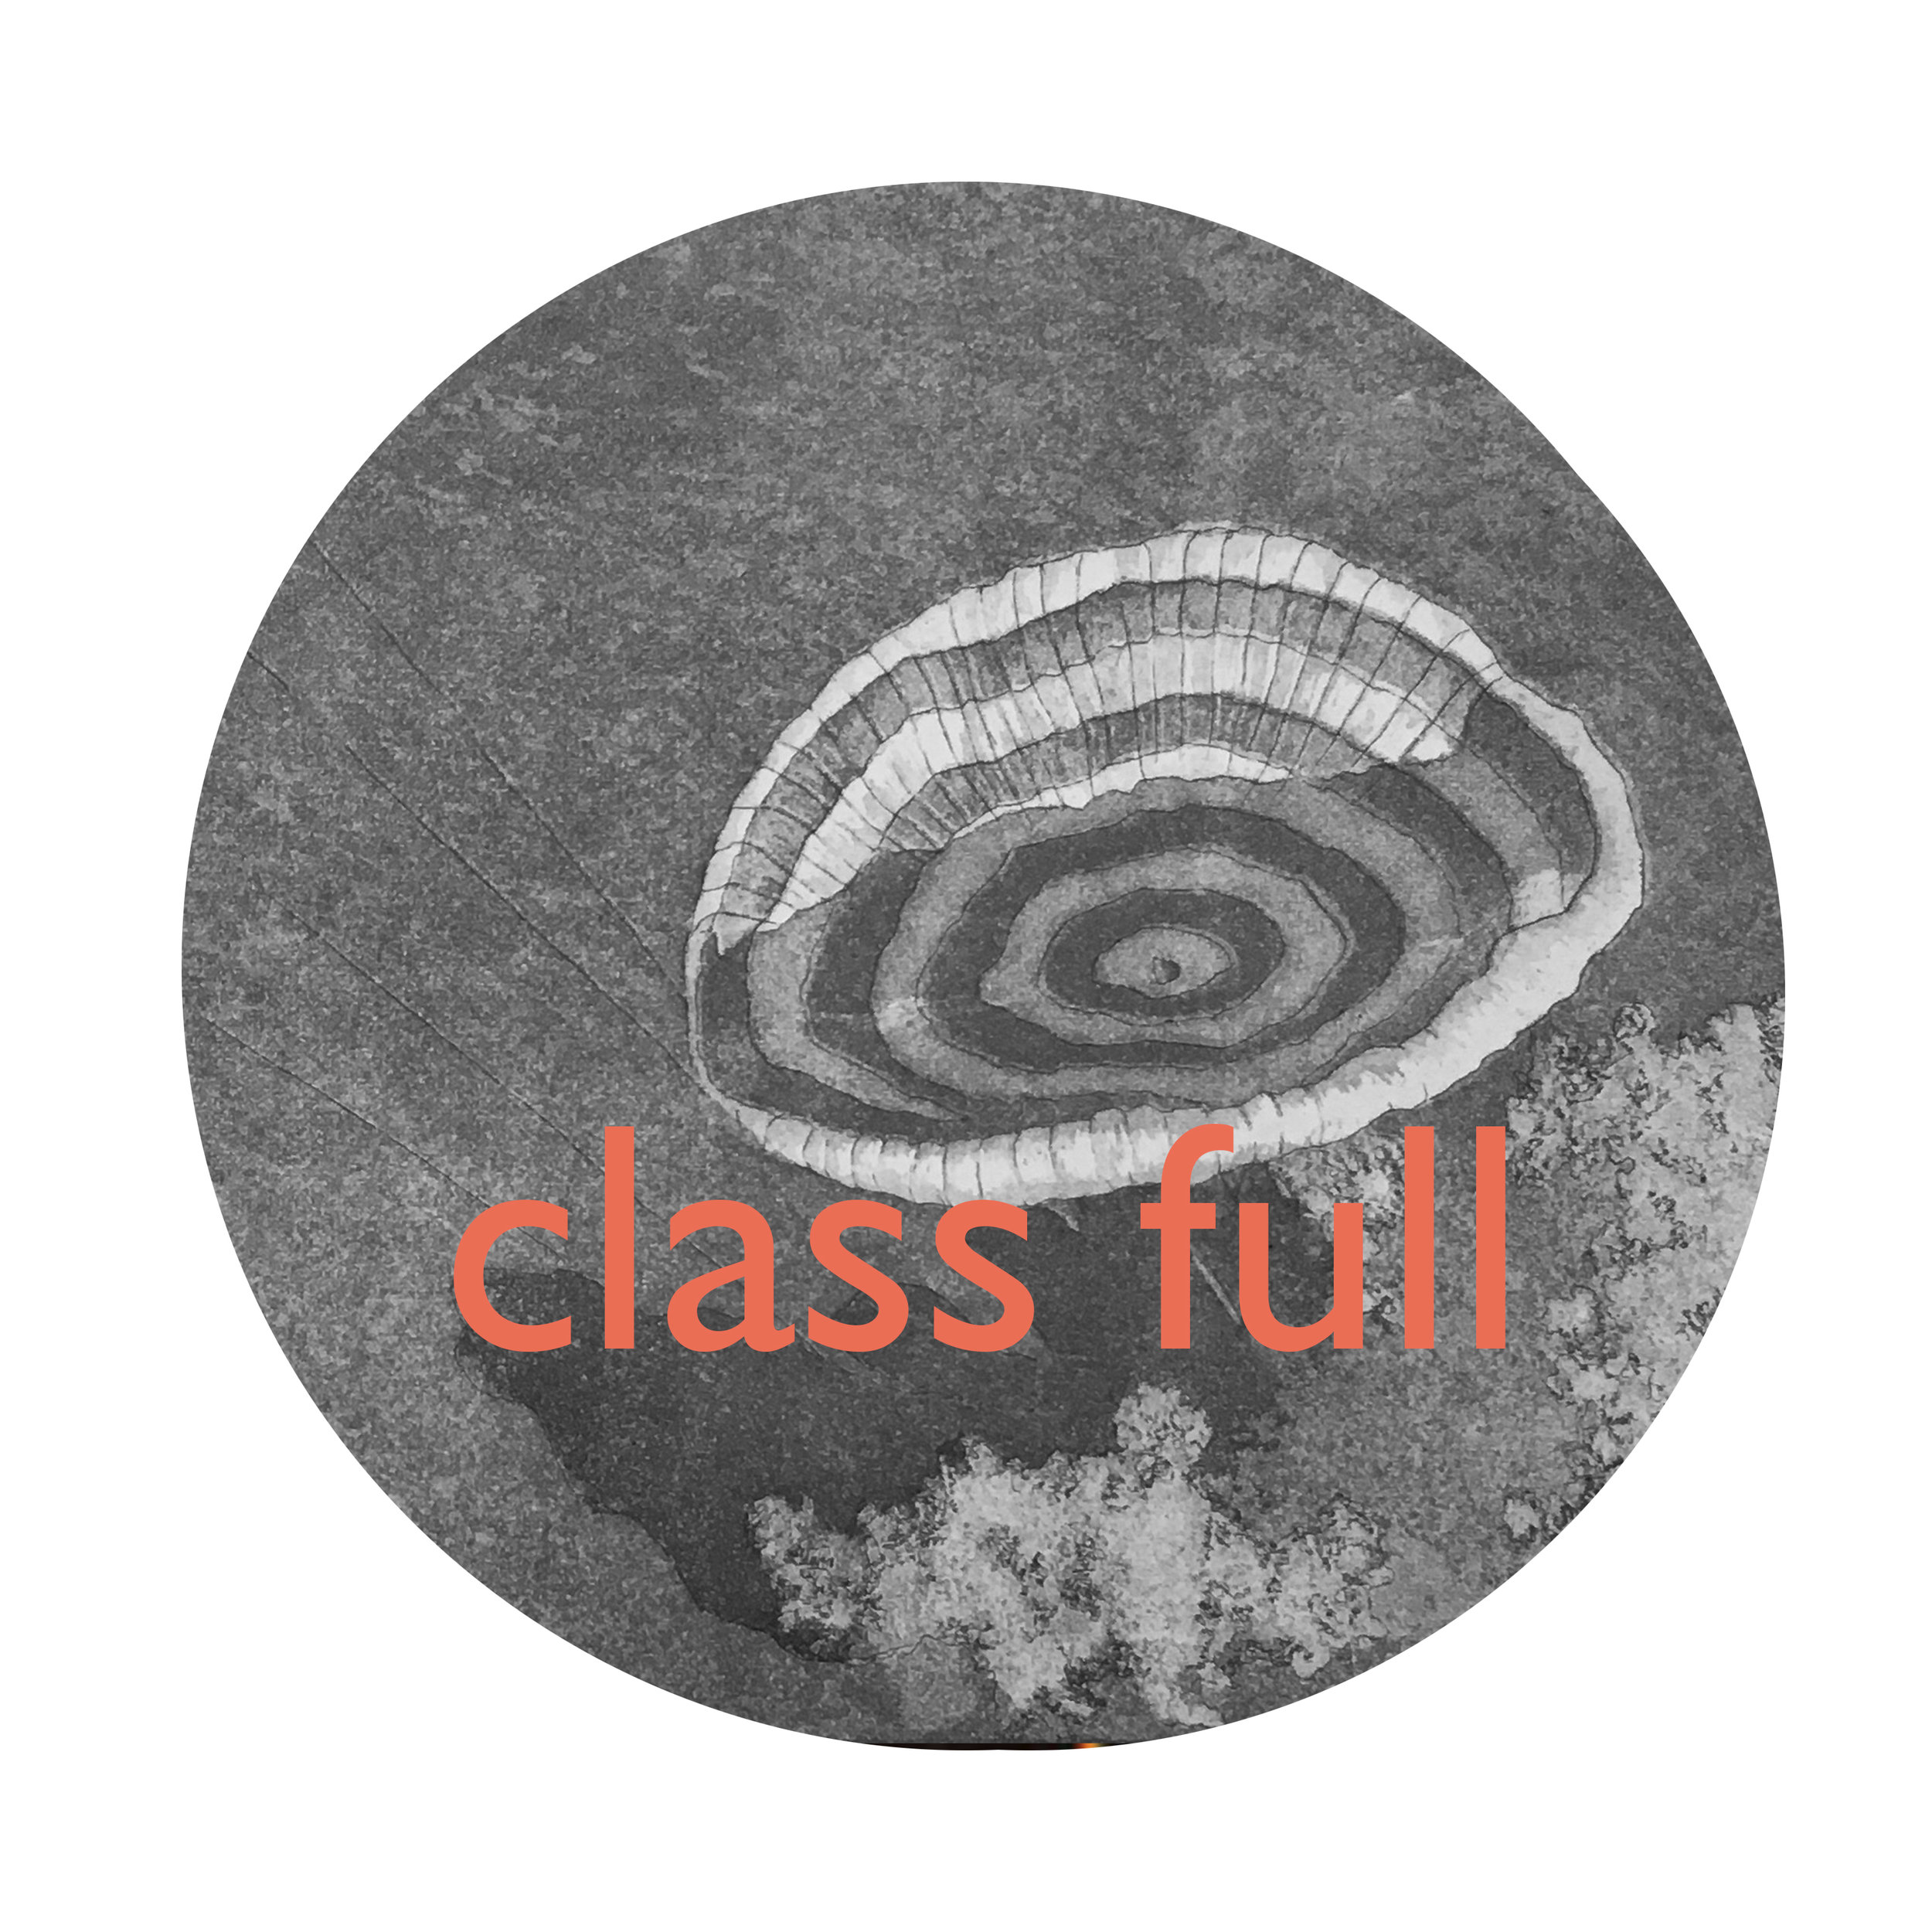 Colour etching_class full 2.jpg